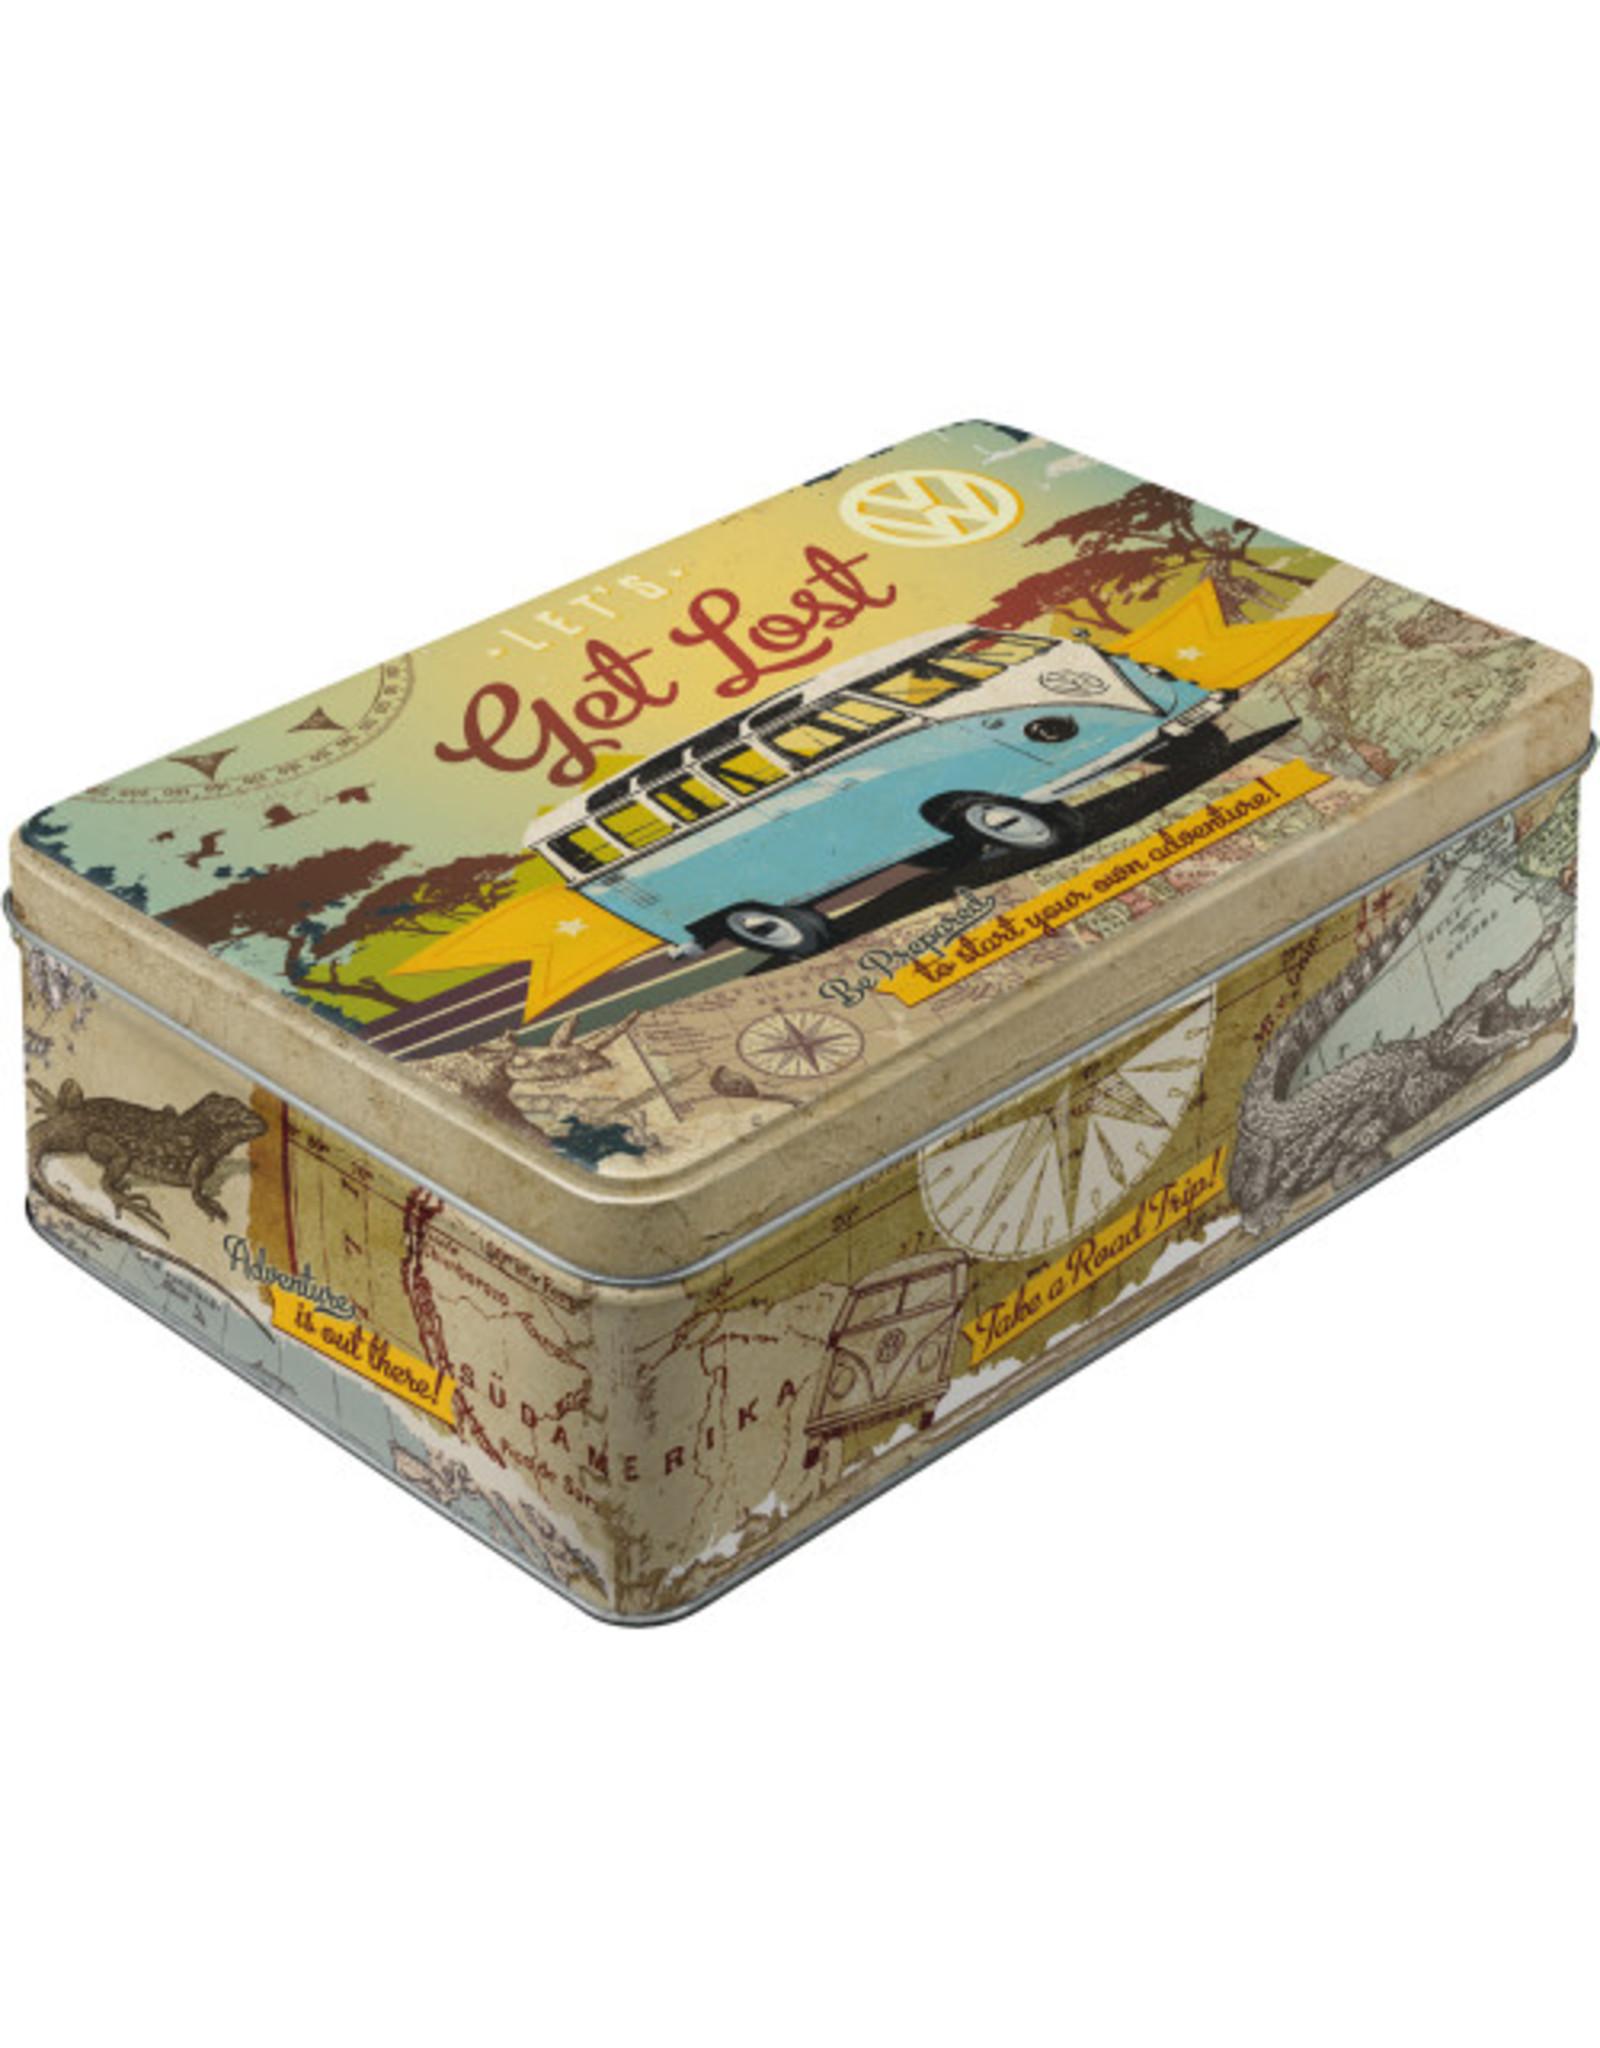 flat tin box - let's get lost VW